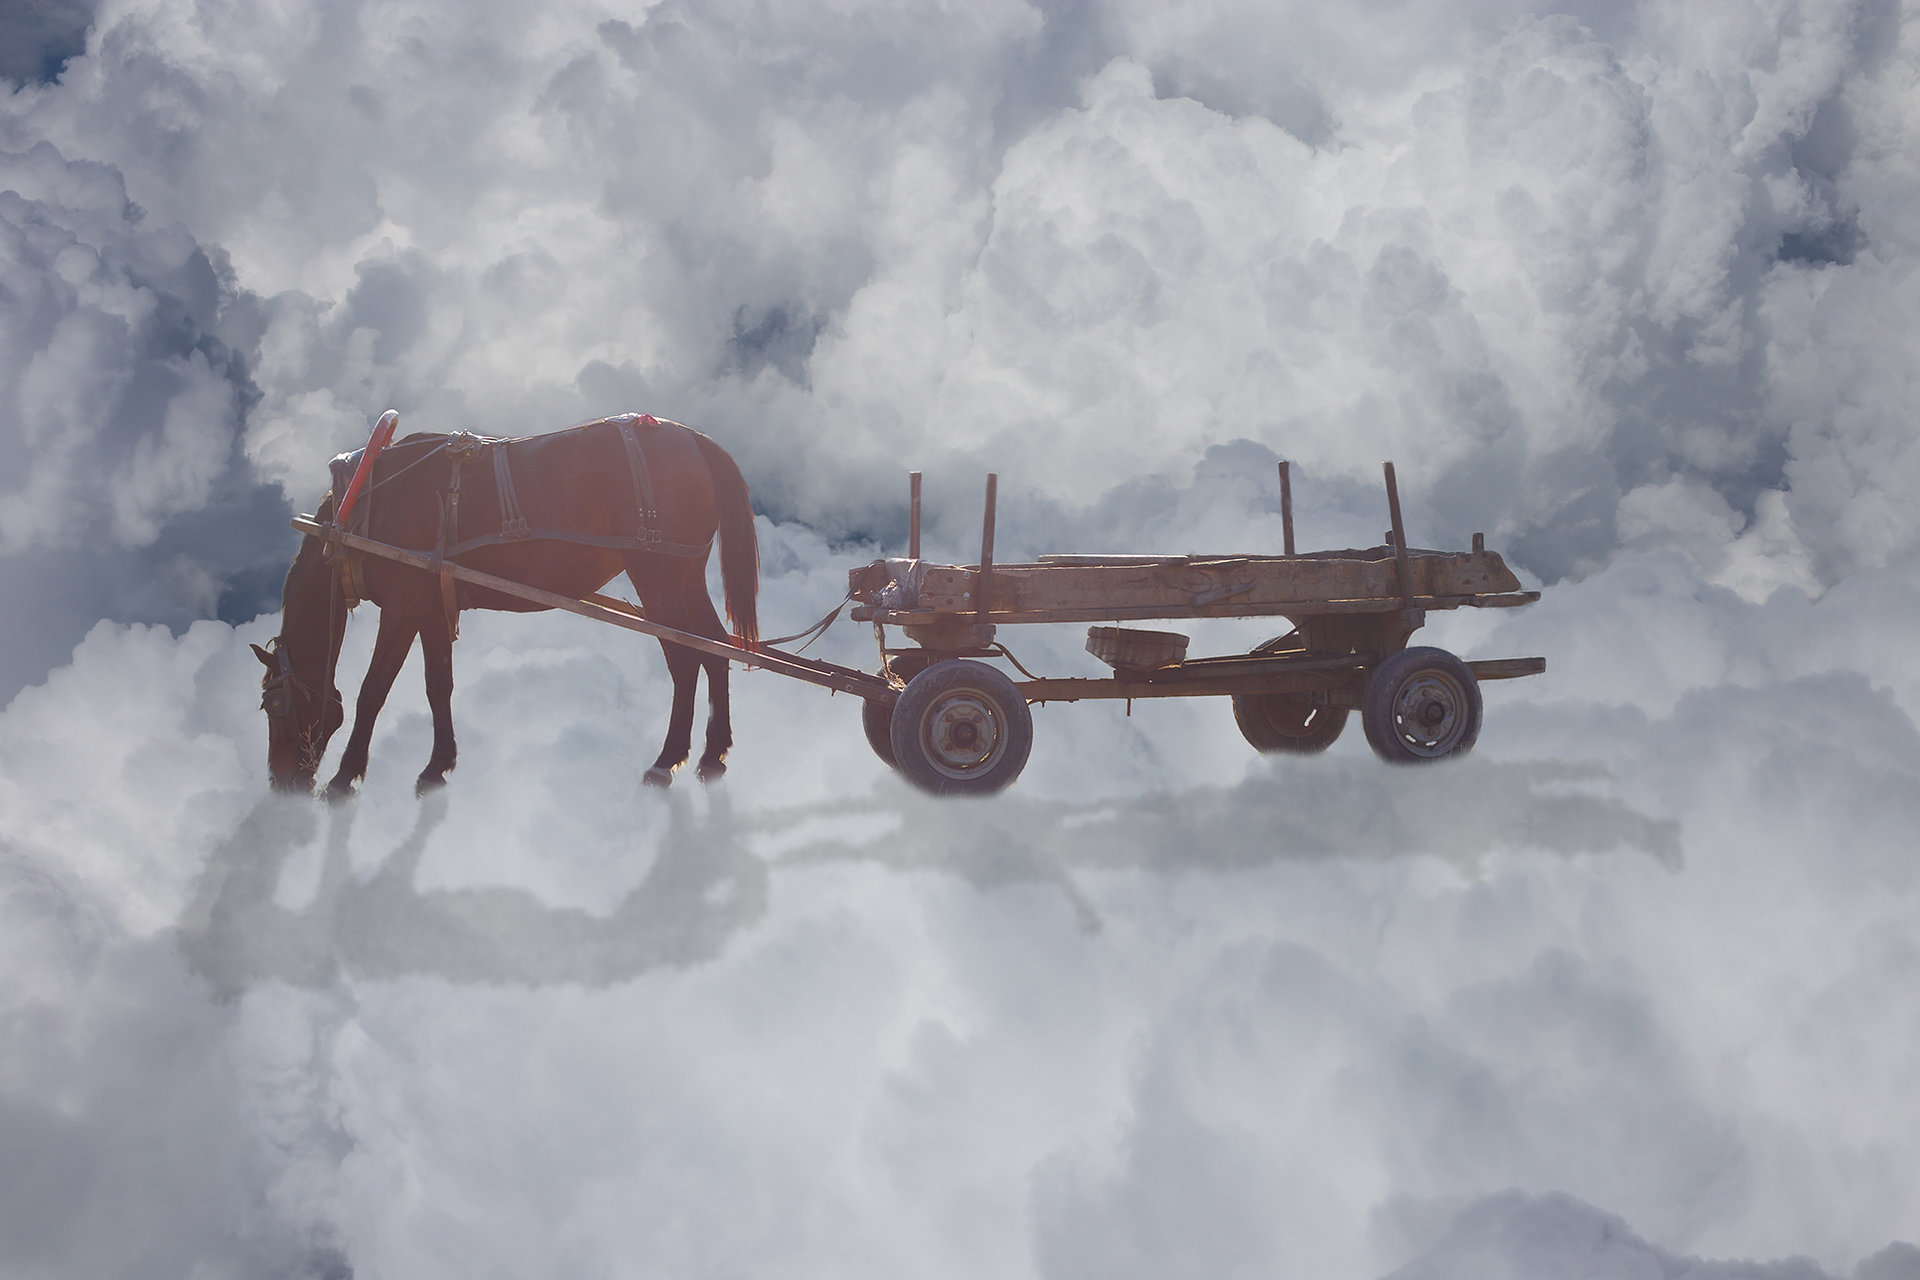 Не ги убиват уморените коне от Станка - Бяла_гарга